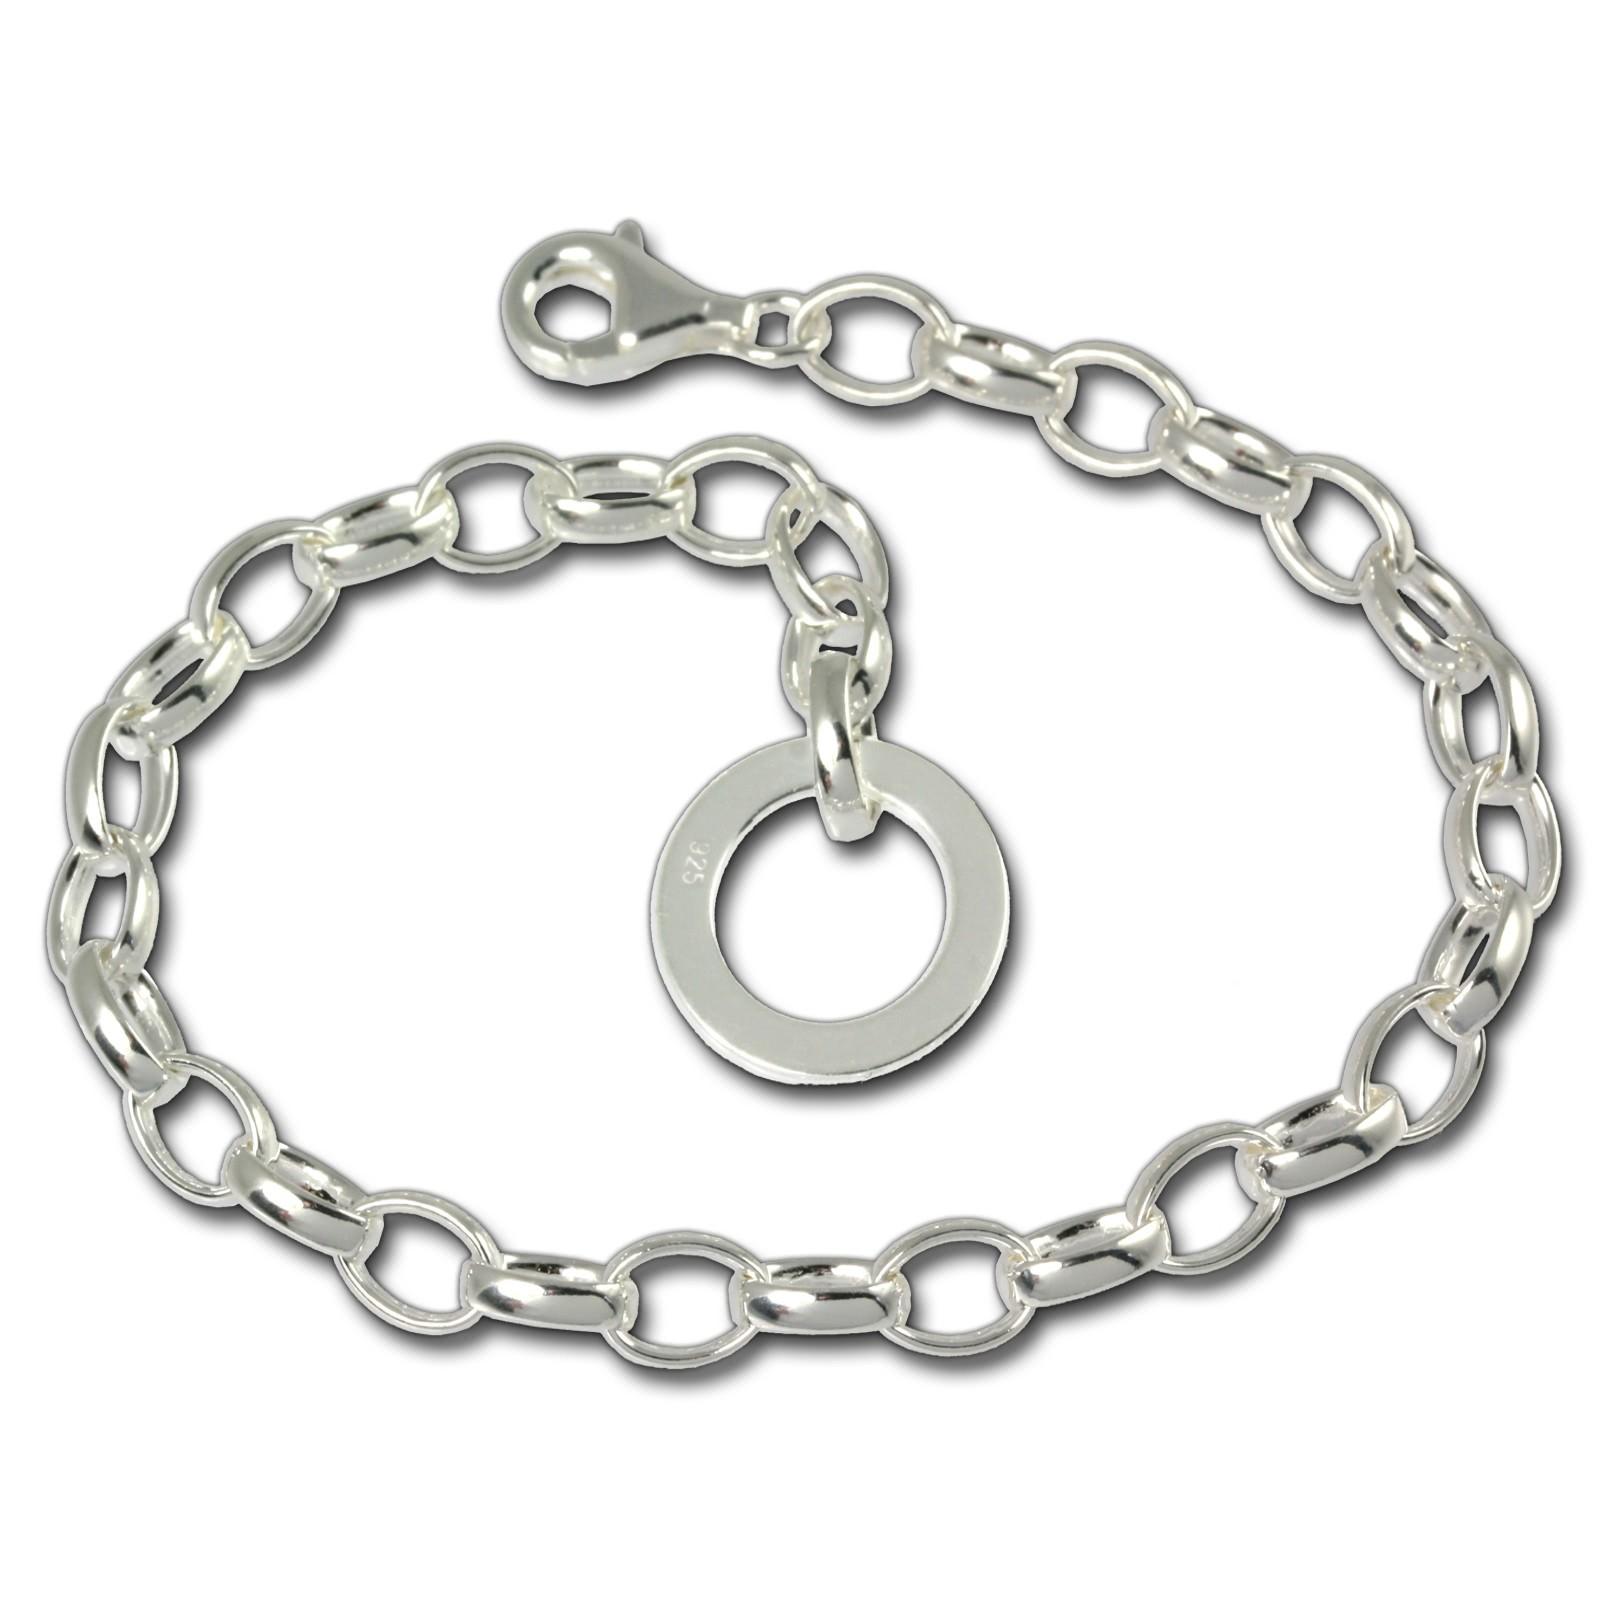 SilberDream Armband mit Plakette 925 Silber Charm Bettelarmband 20cm FC0703